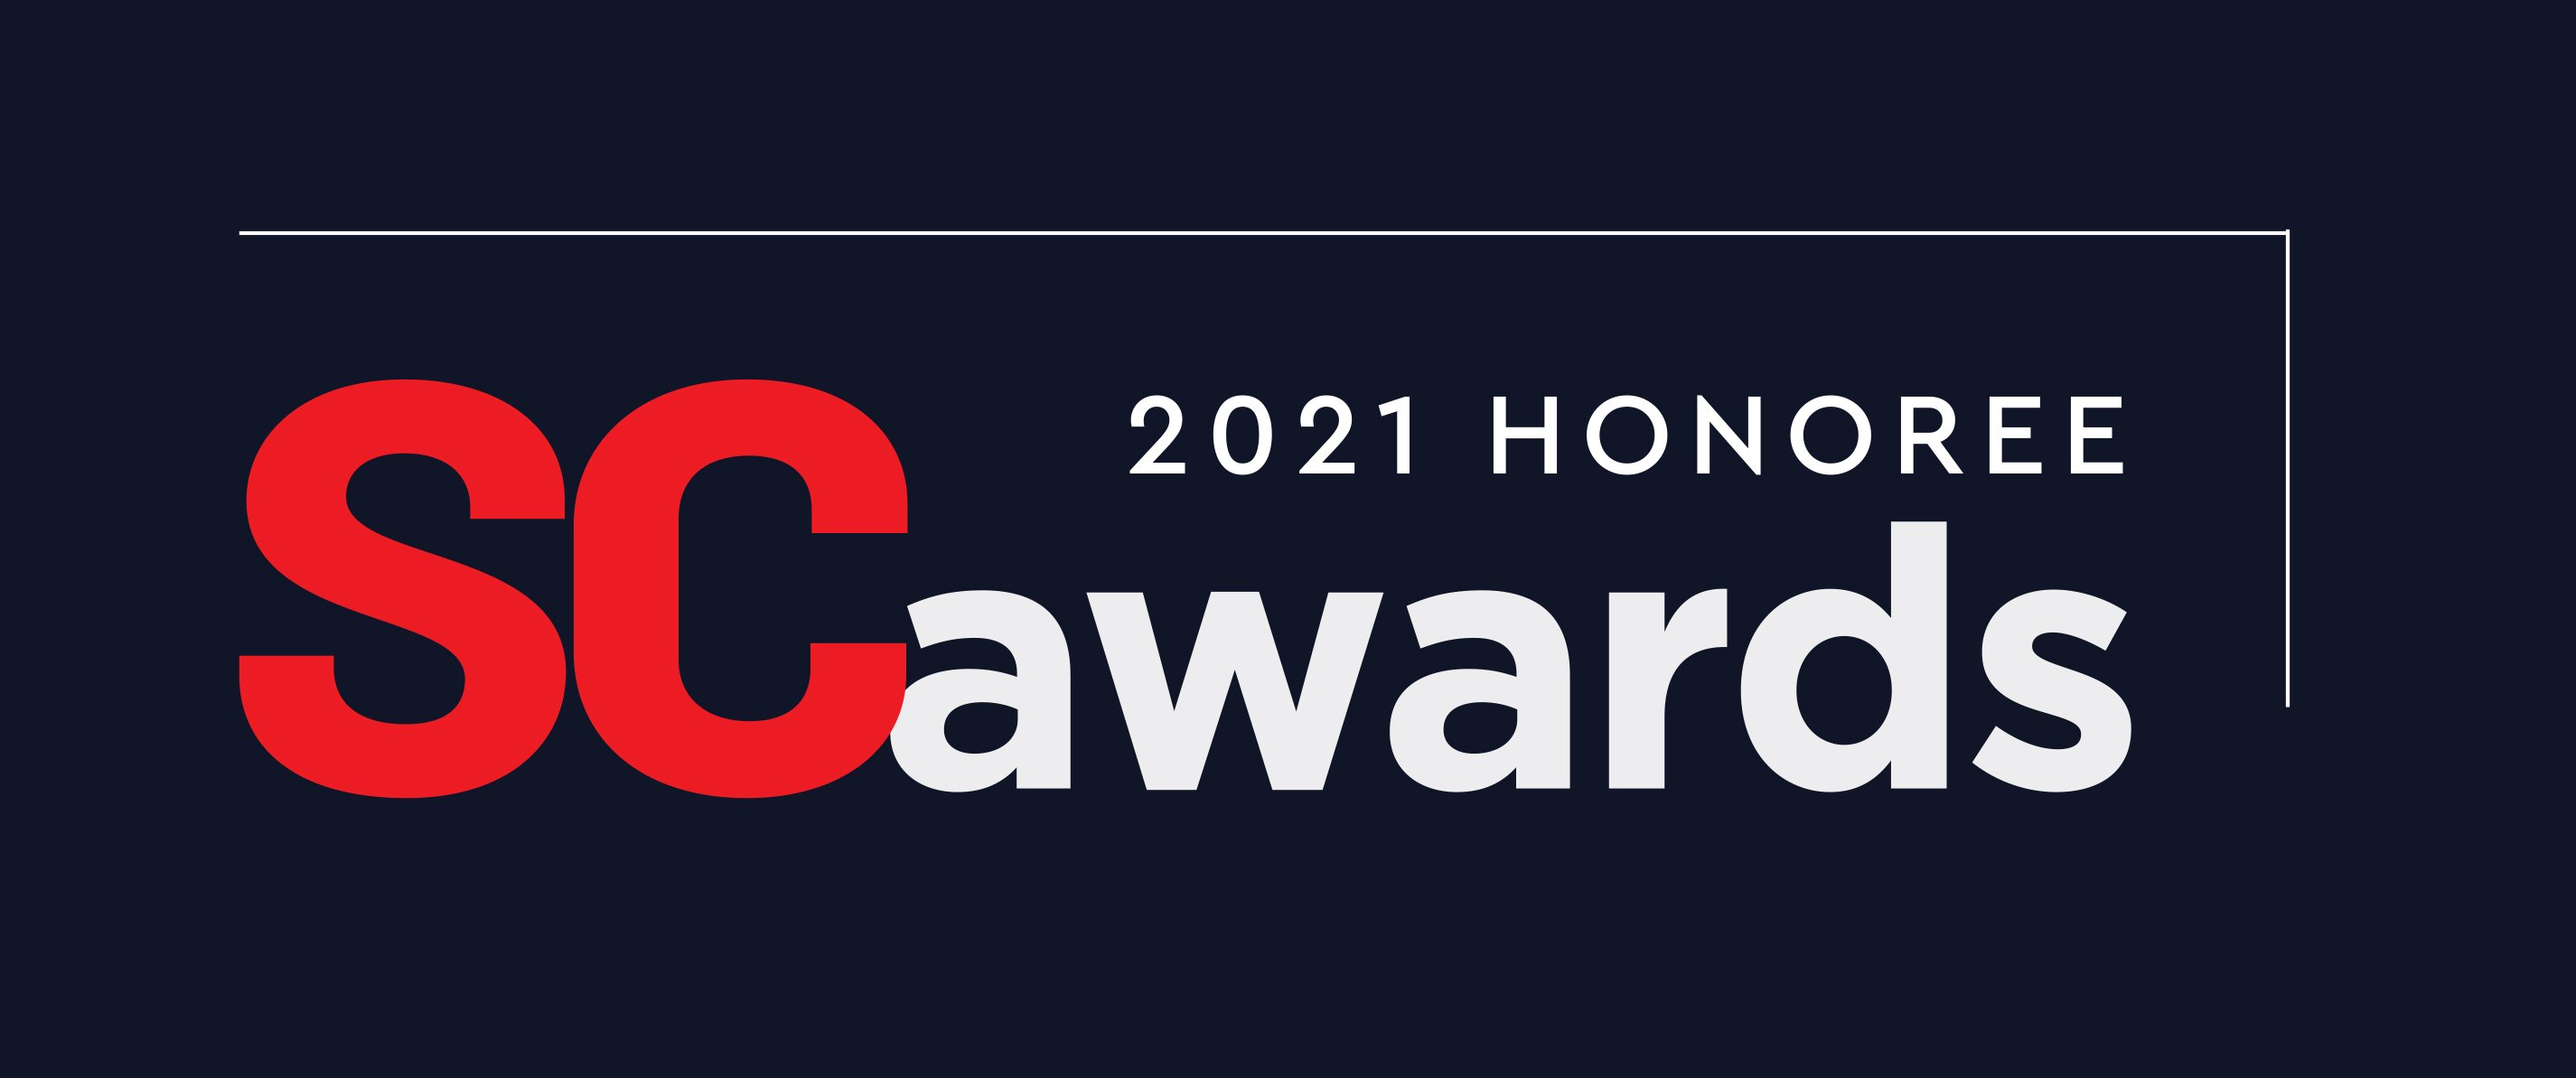 SCAwards_Honoree2021-REVERSE-1